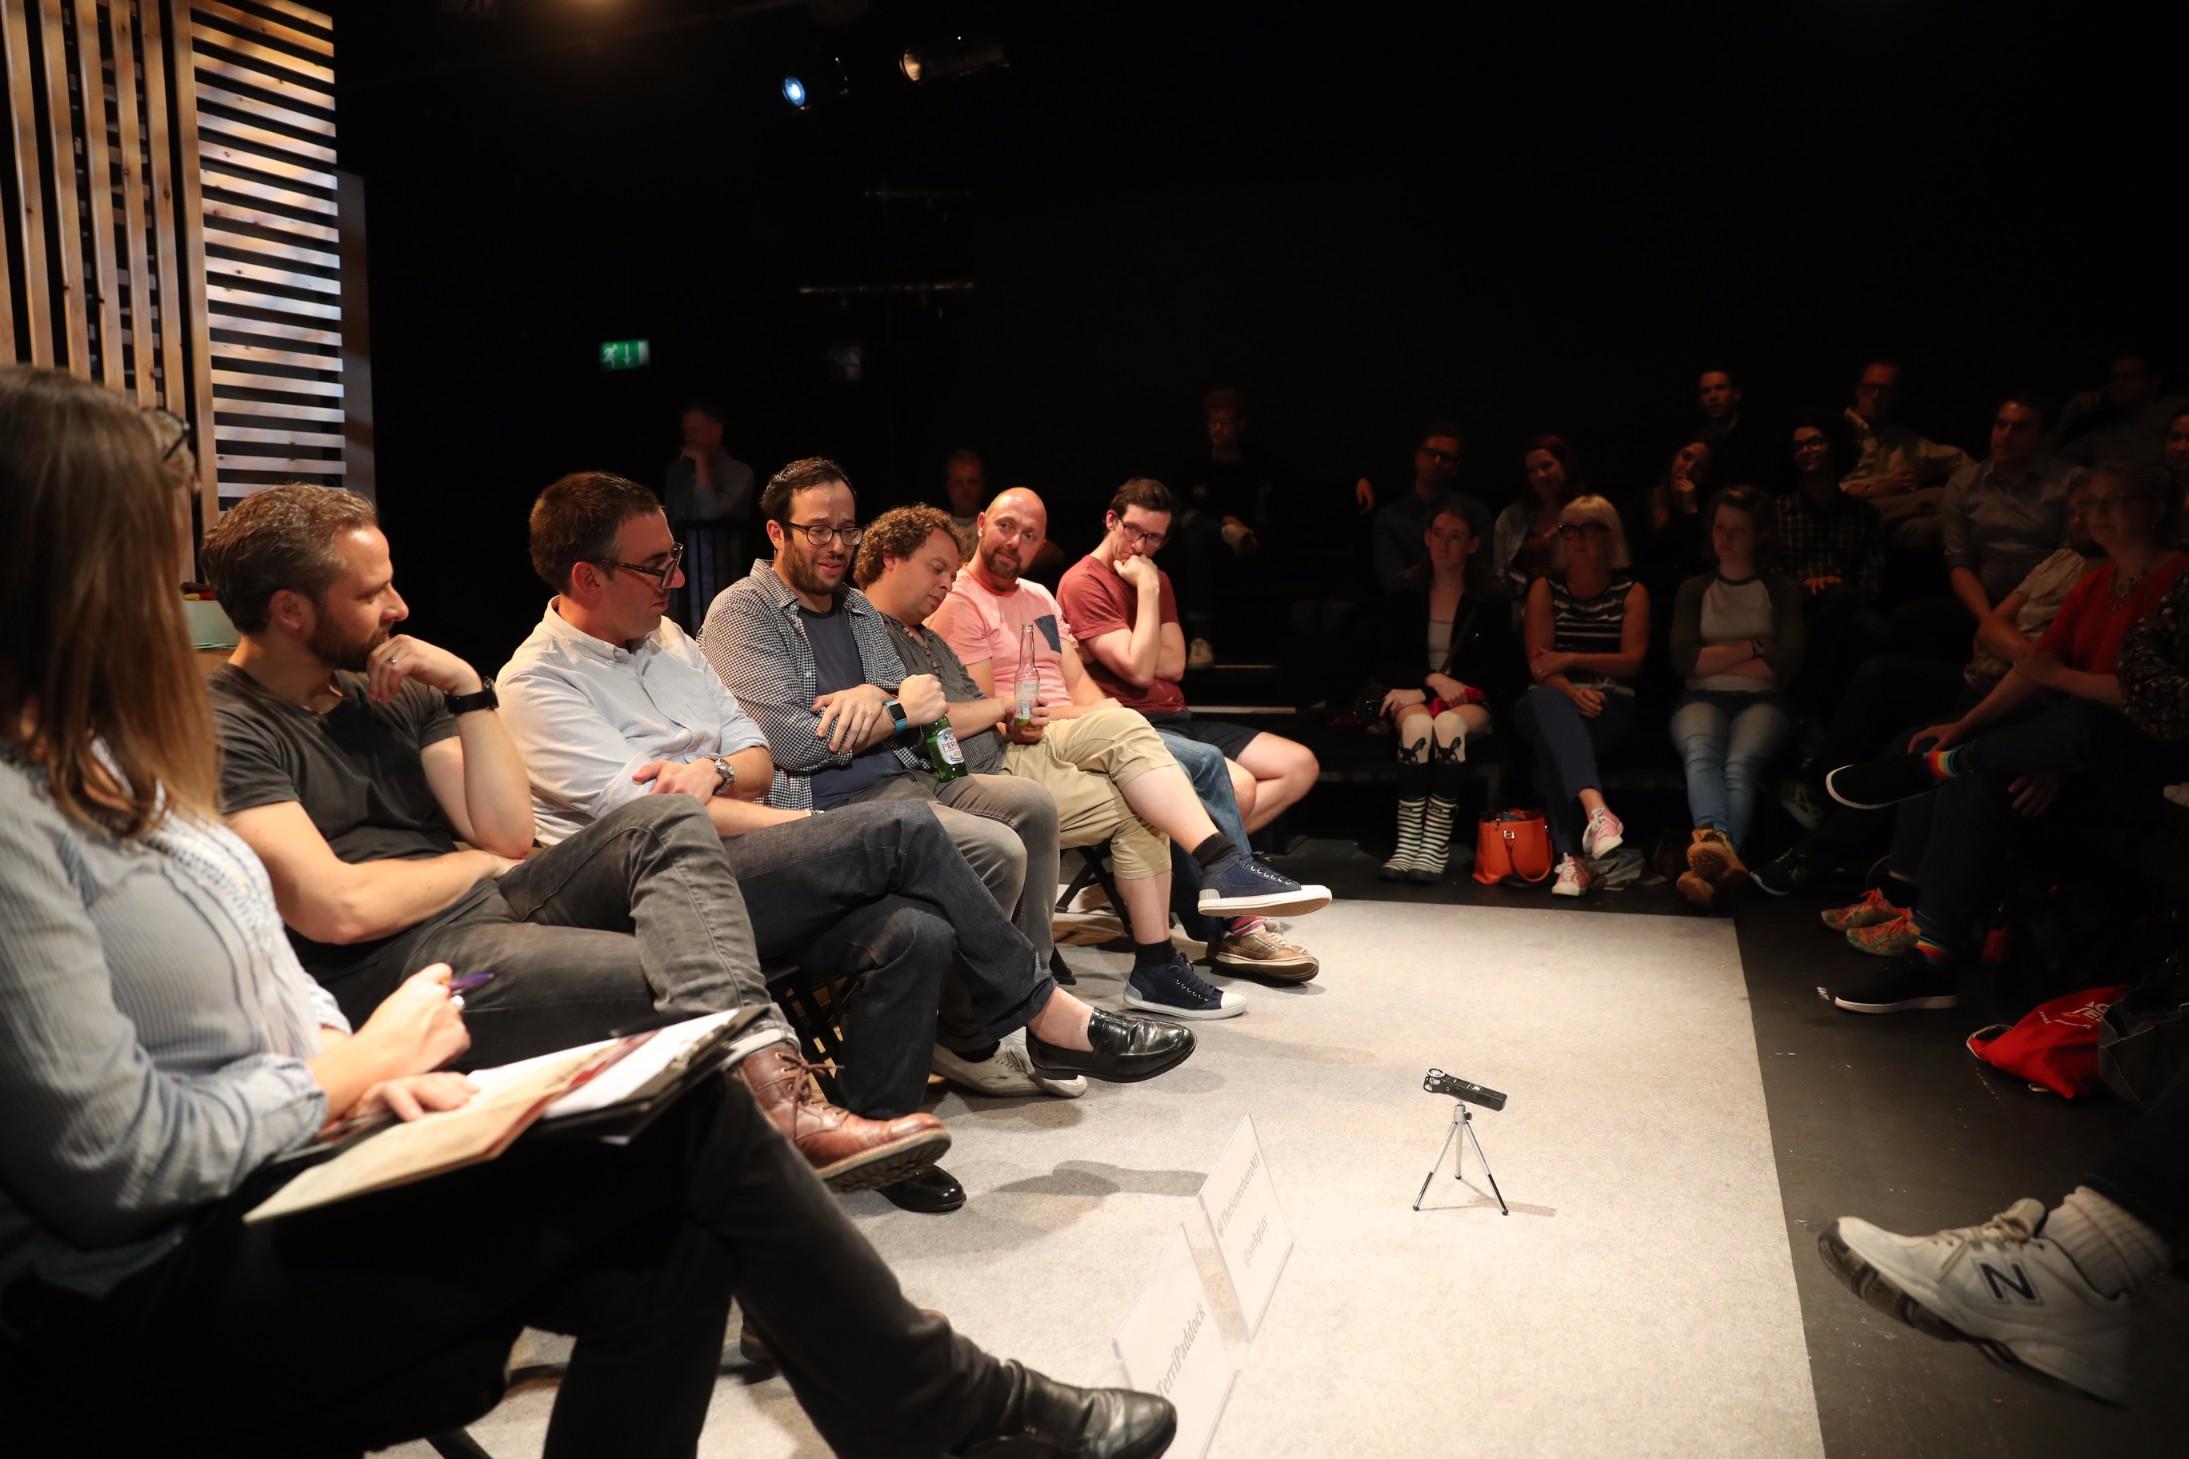 SuperHero-at-the-Southwark-Playhouse-16